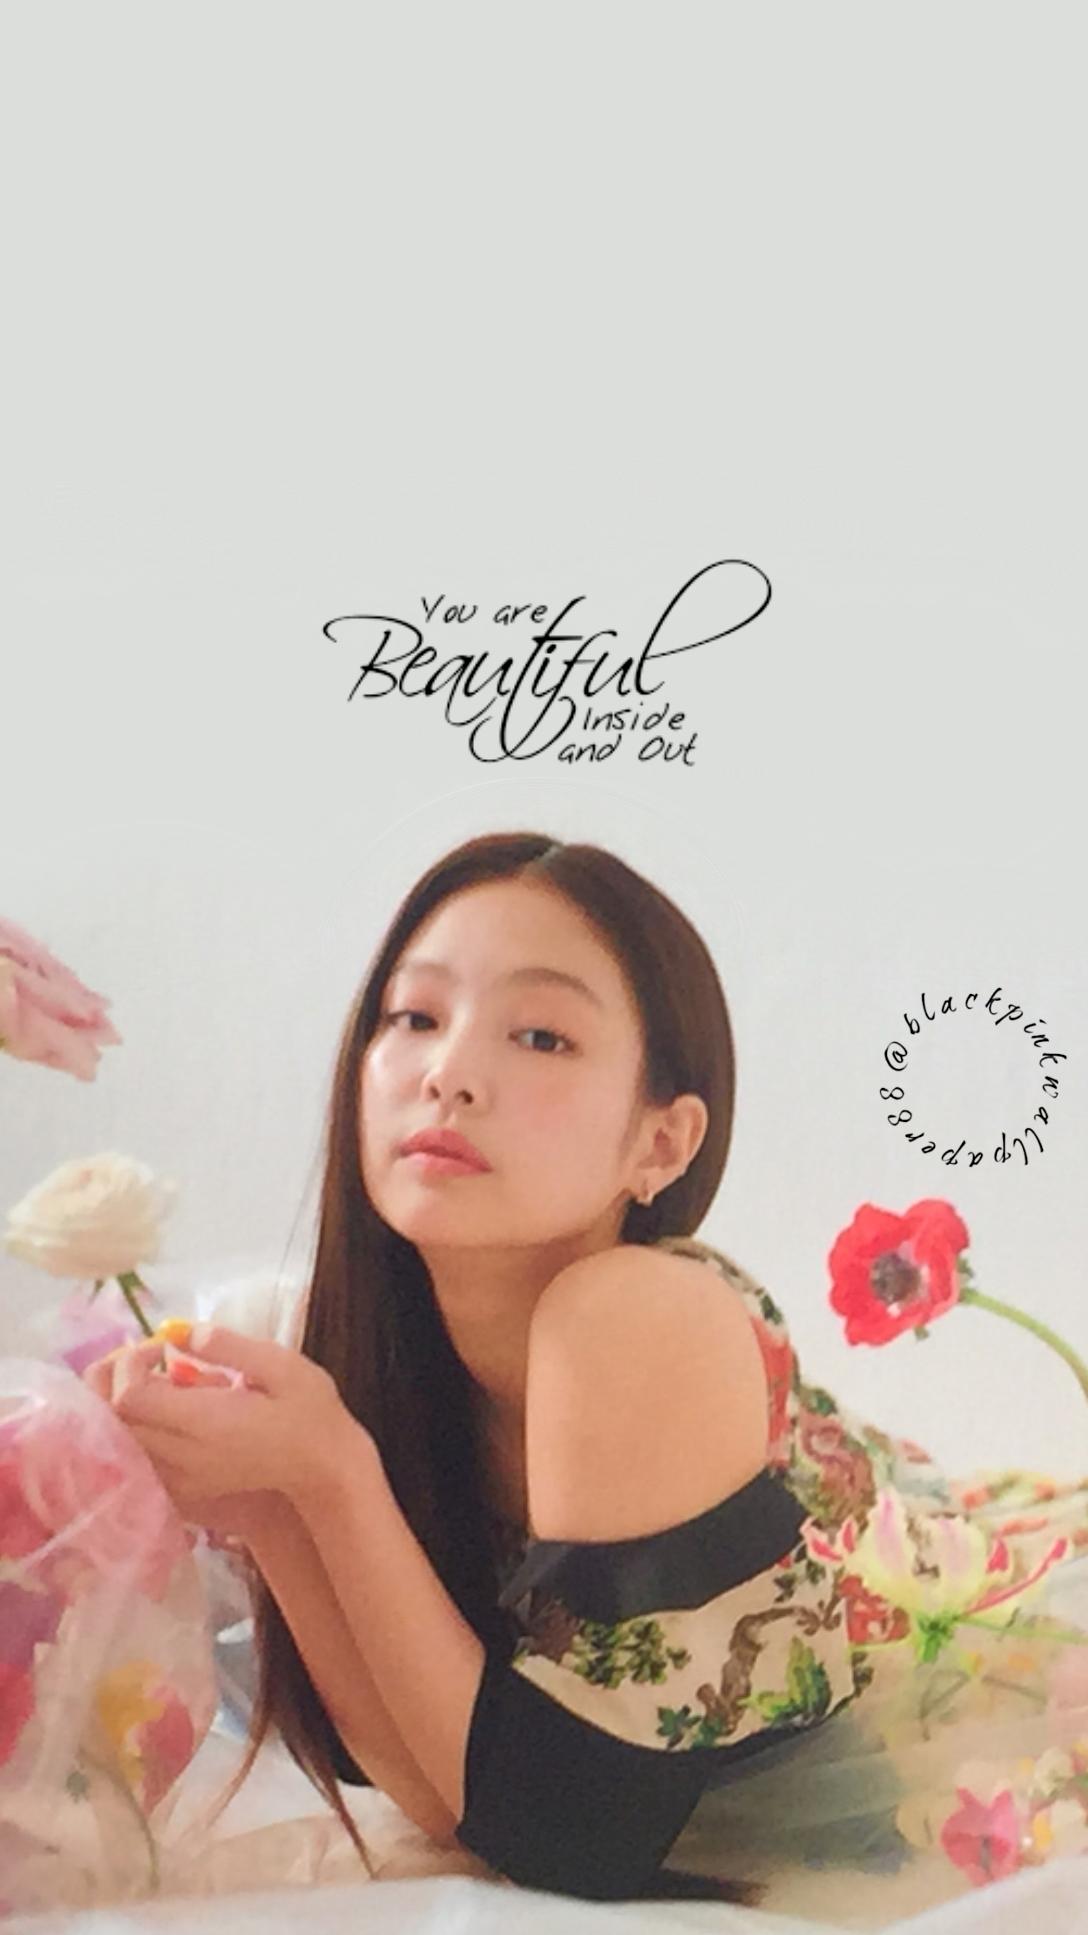 Download 640+ Wallpaper Iphone Rose Blackpink HD Paling Keren